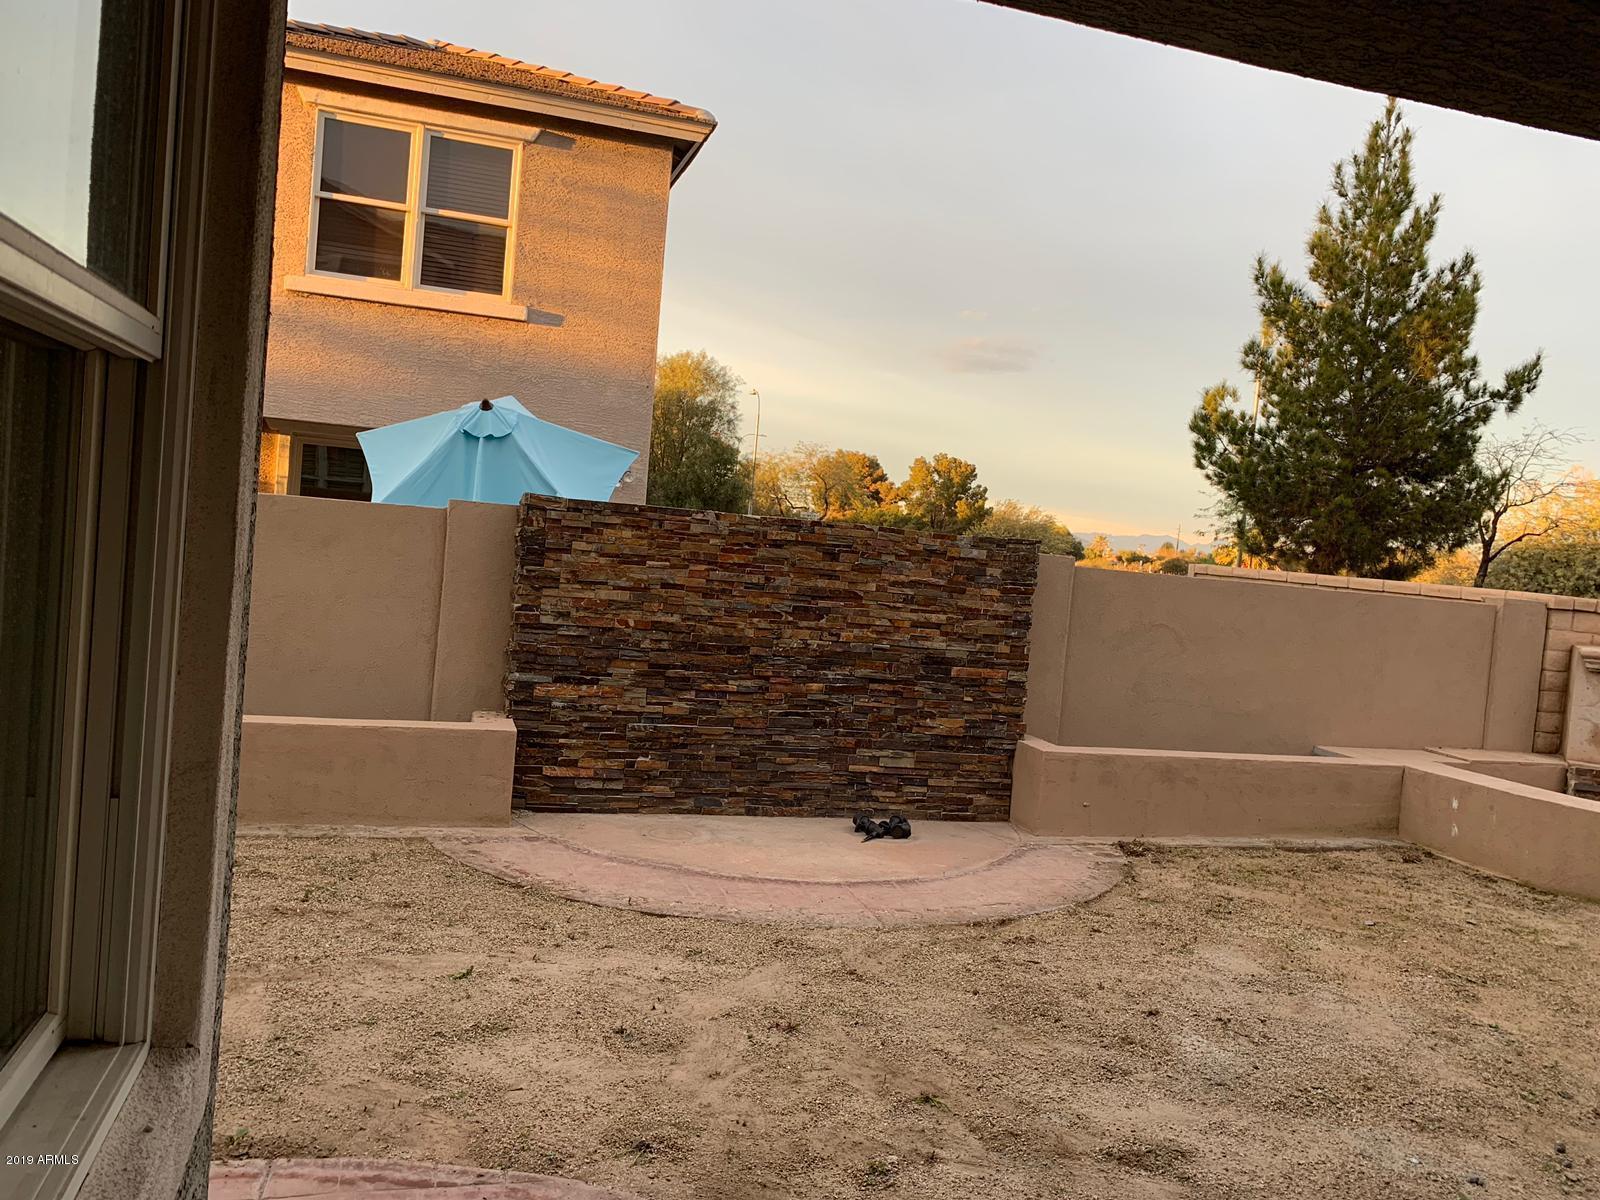 MLS 5896432 2354 E SUNLAND Avenue, Phoenix, AZ 85040 Phoenix AZ Copper Leaf